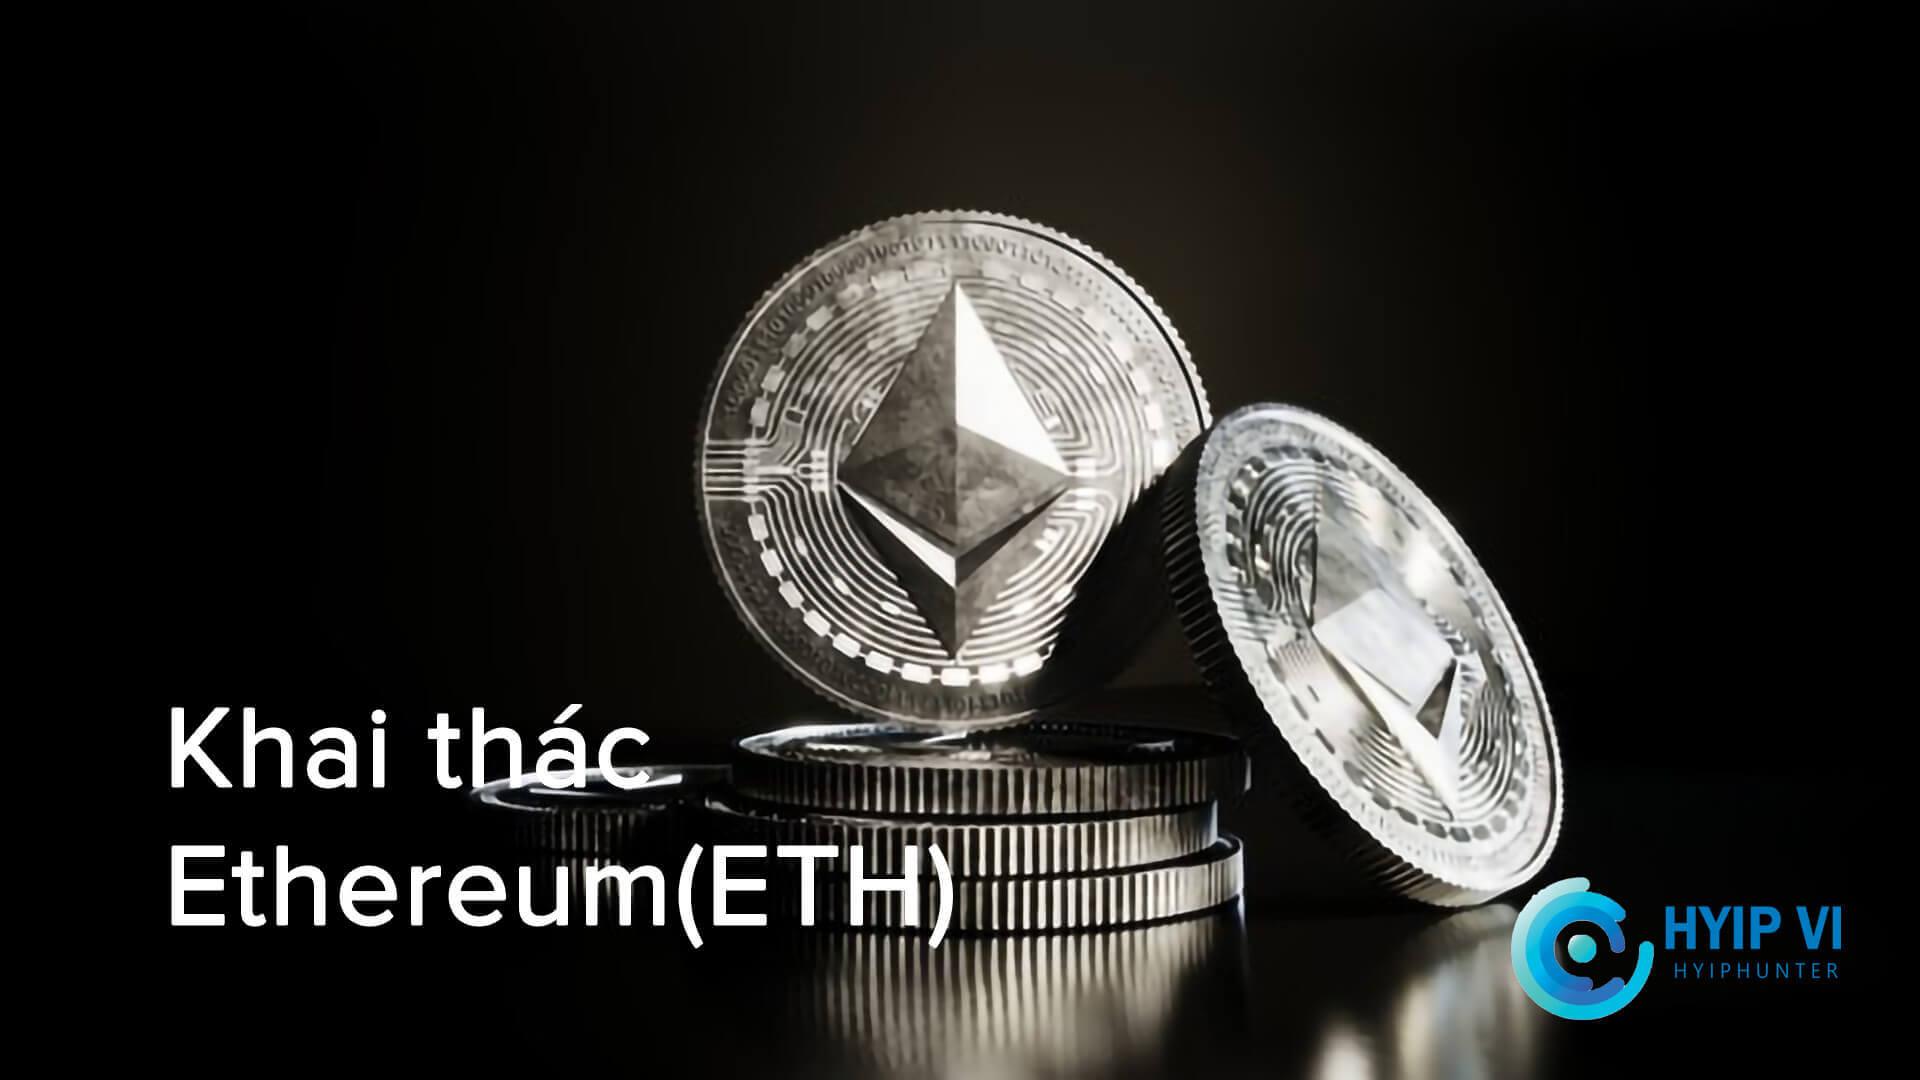 Cách khai thác - đào ETH(Ethereum)